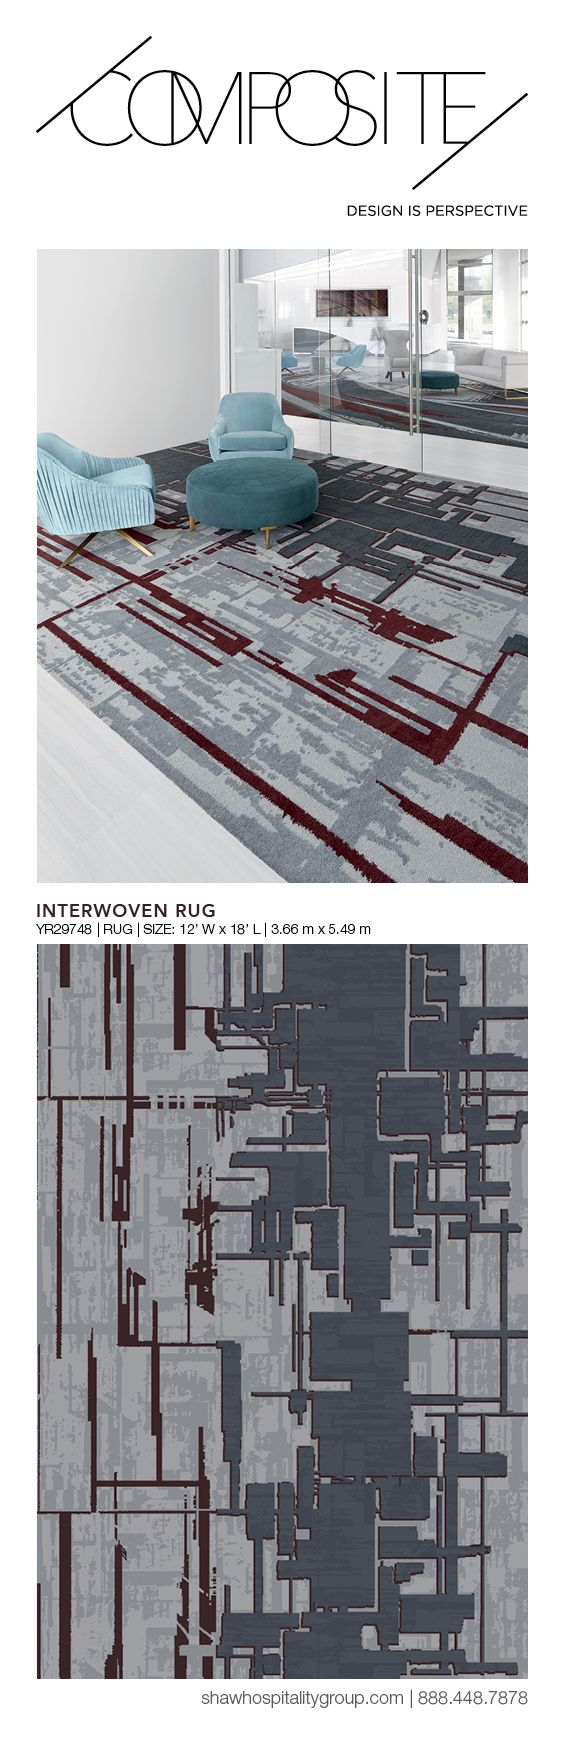 Interwoven Rug